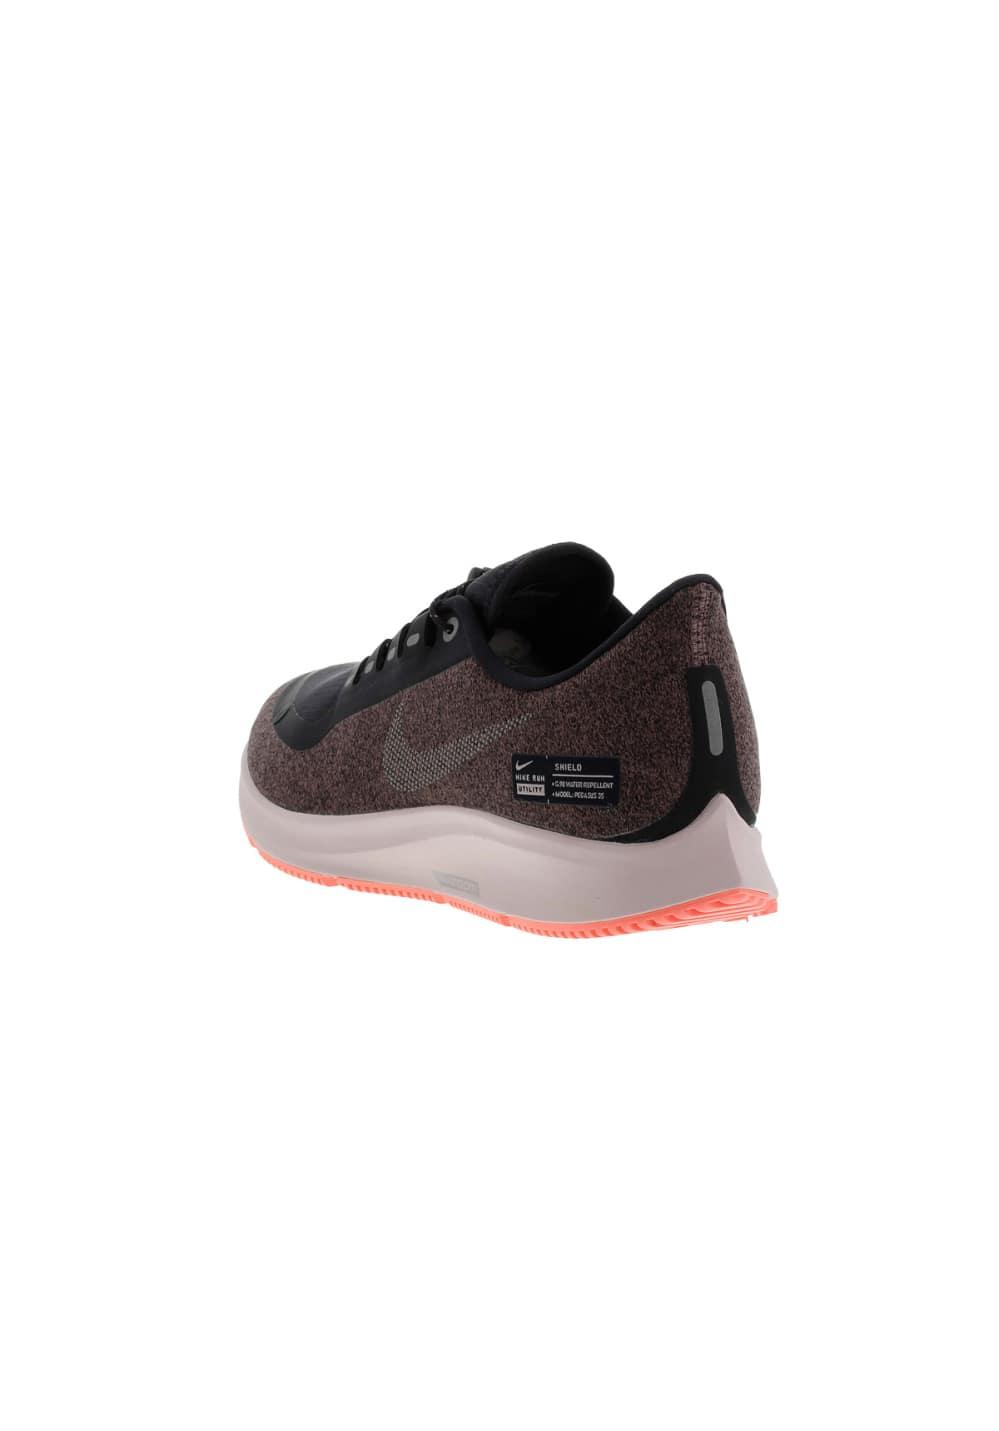 b5919123ce545 Nike Air Zoom Pegasus 35 Rn Shield - Running shoes for Women - Black ...